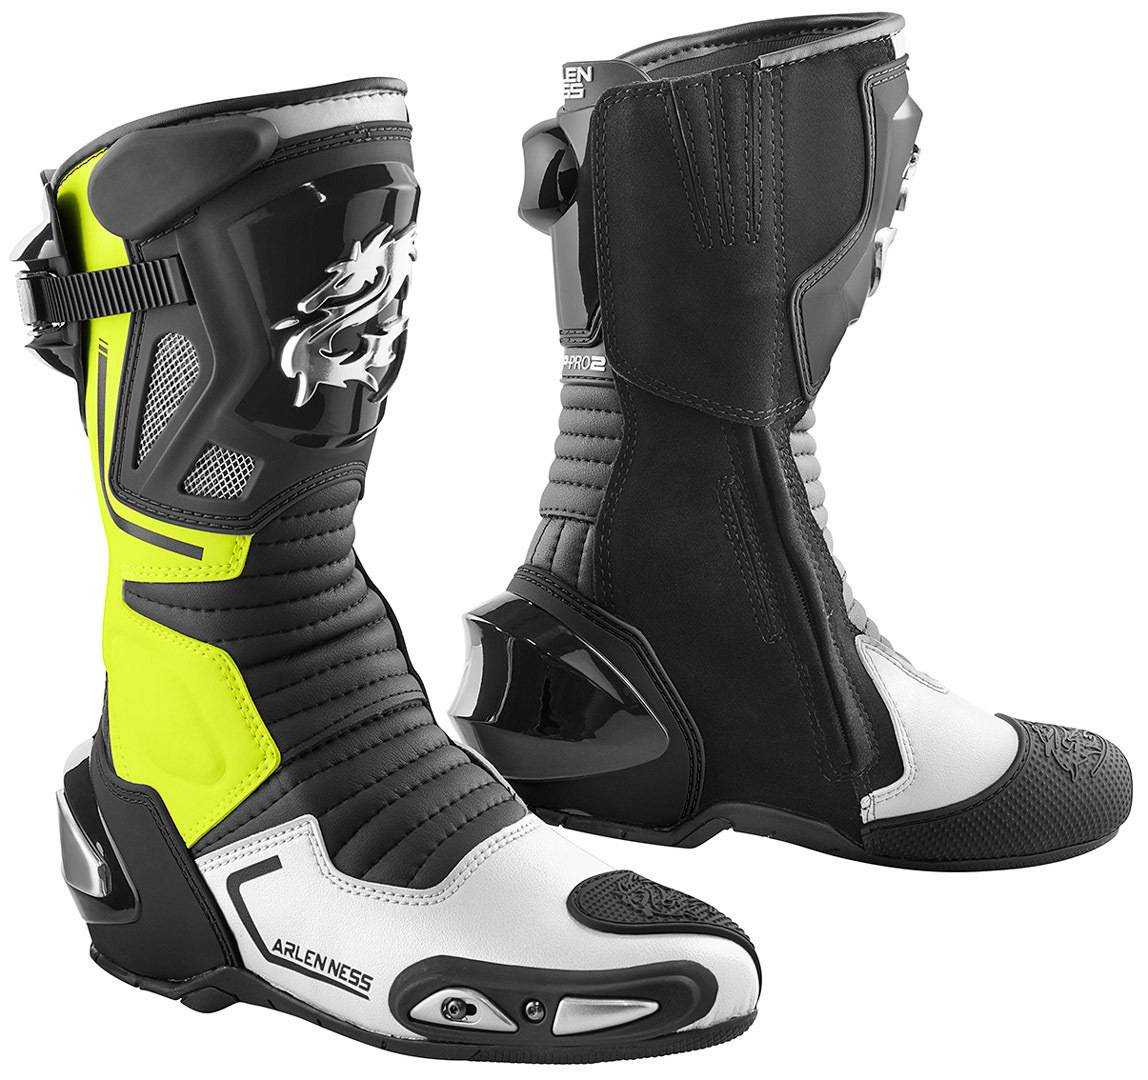 Arlen Ness Sugello Bottes de moto Noir Jaune taille : 43